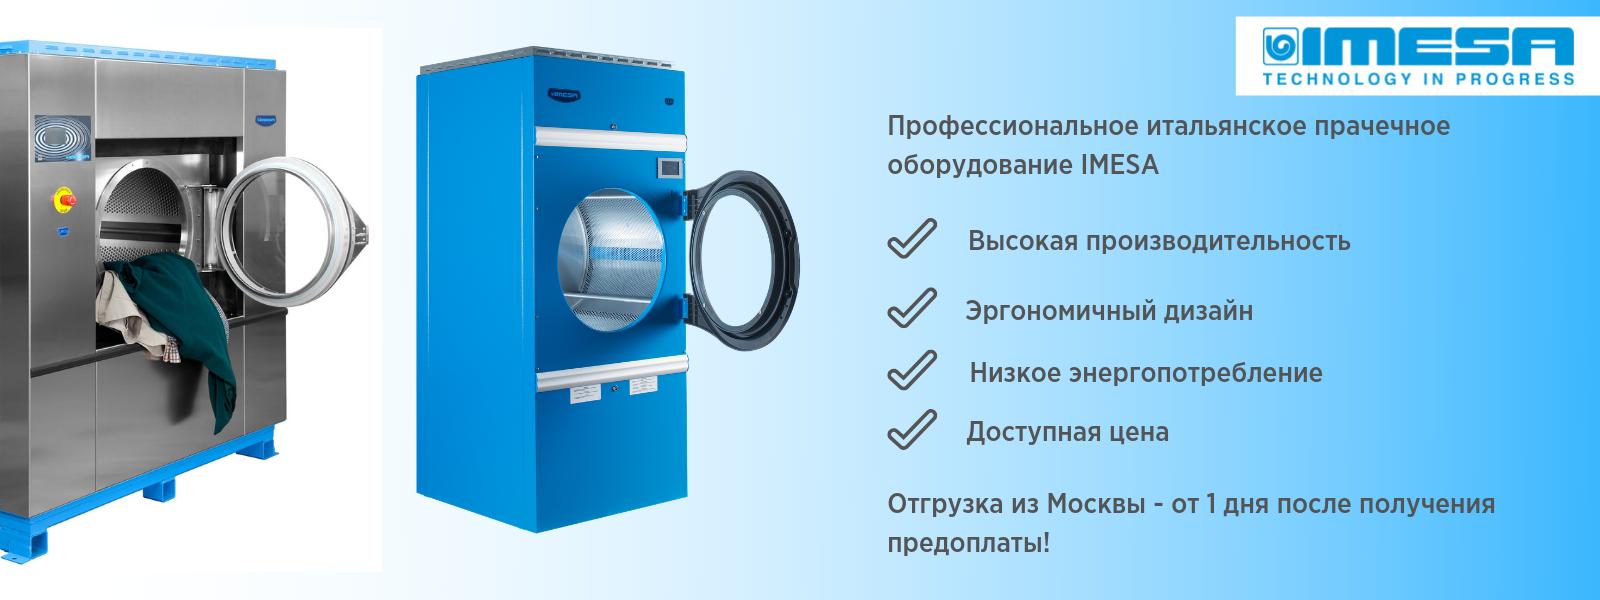 Прачечное оборудование IMESA – в наличии на складе PROFITEX